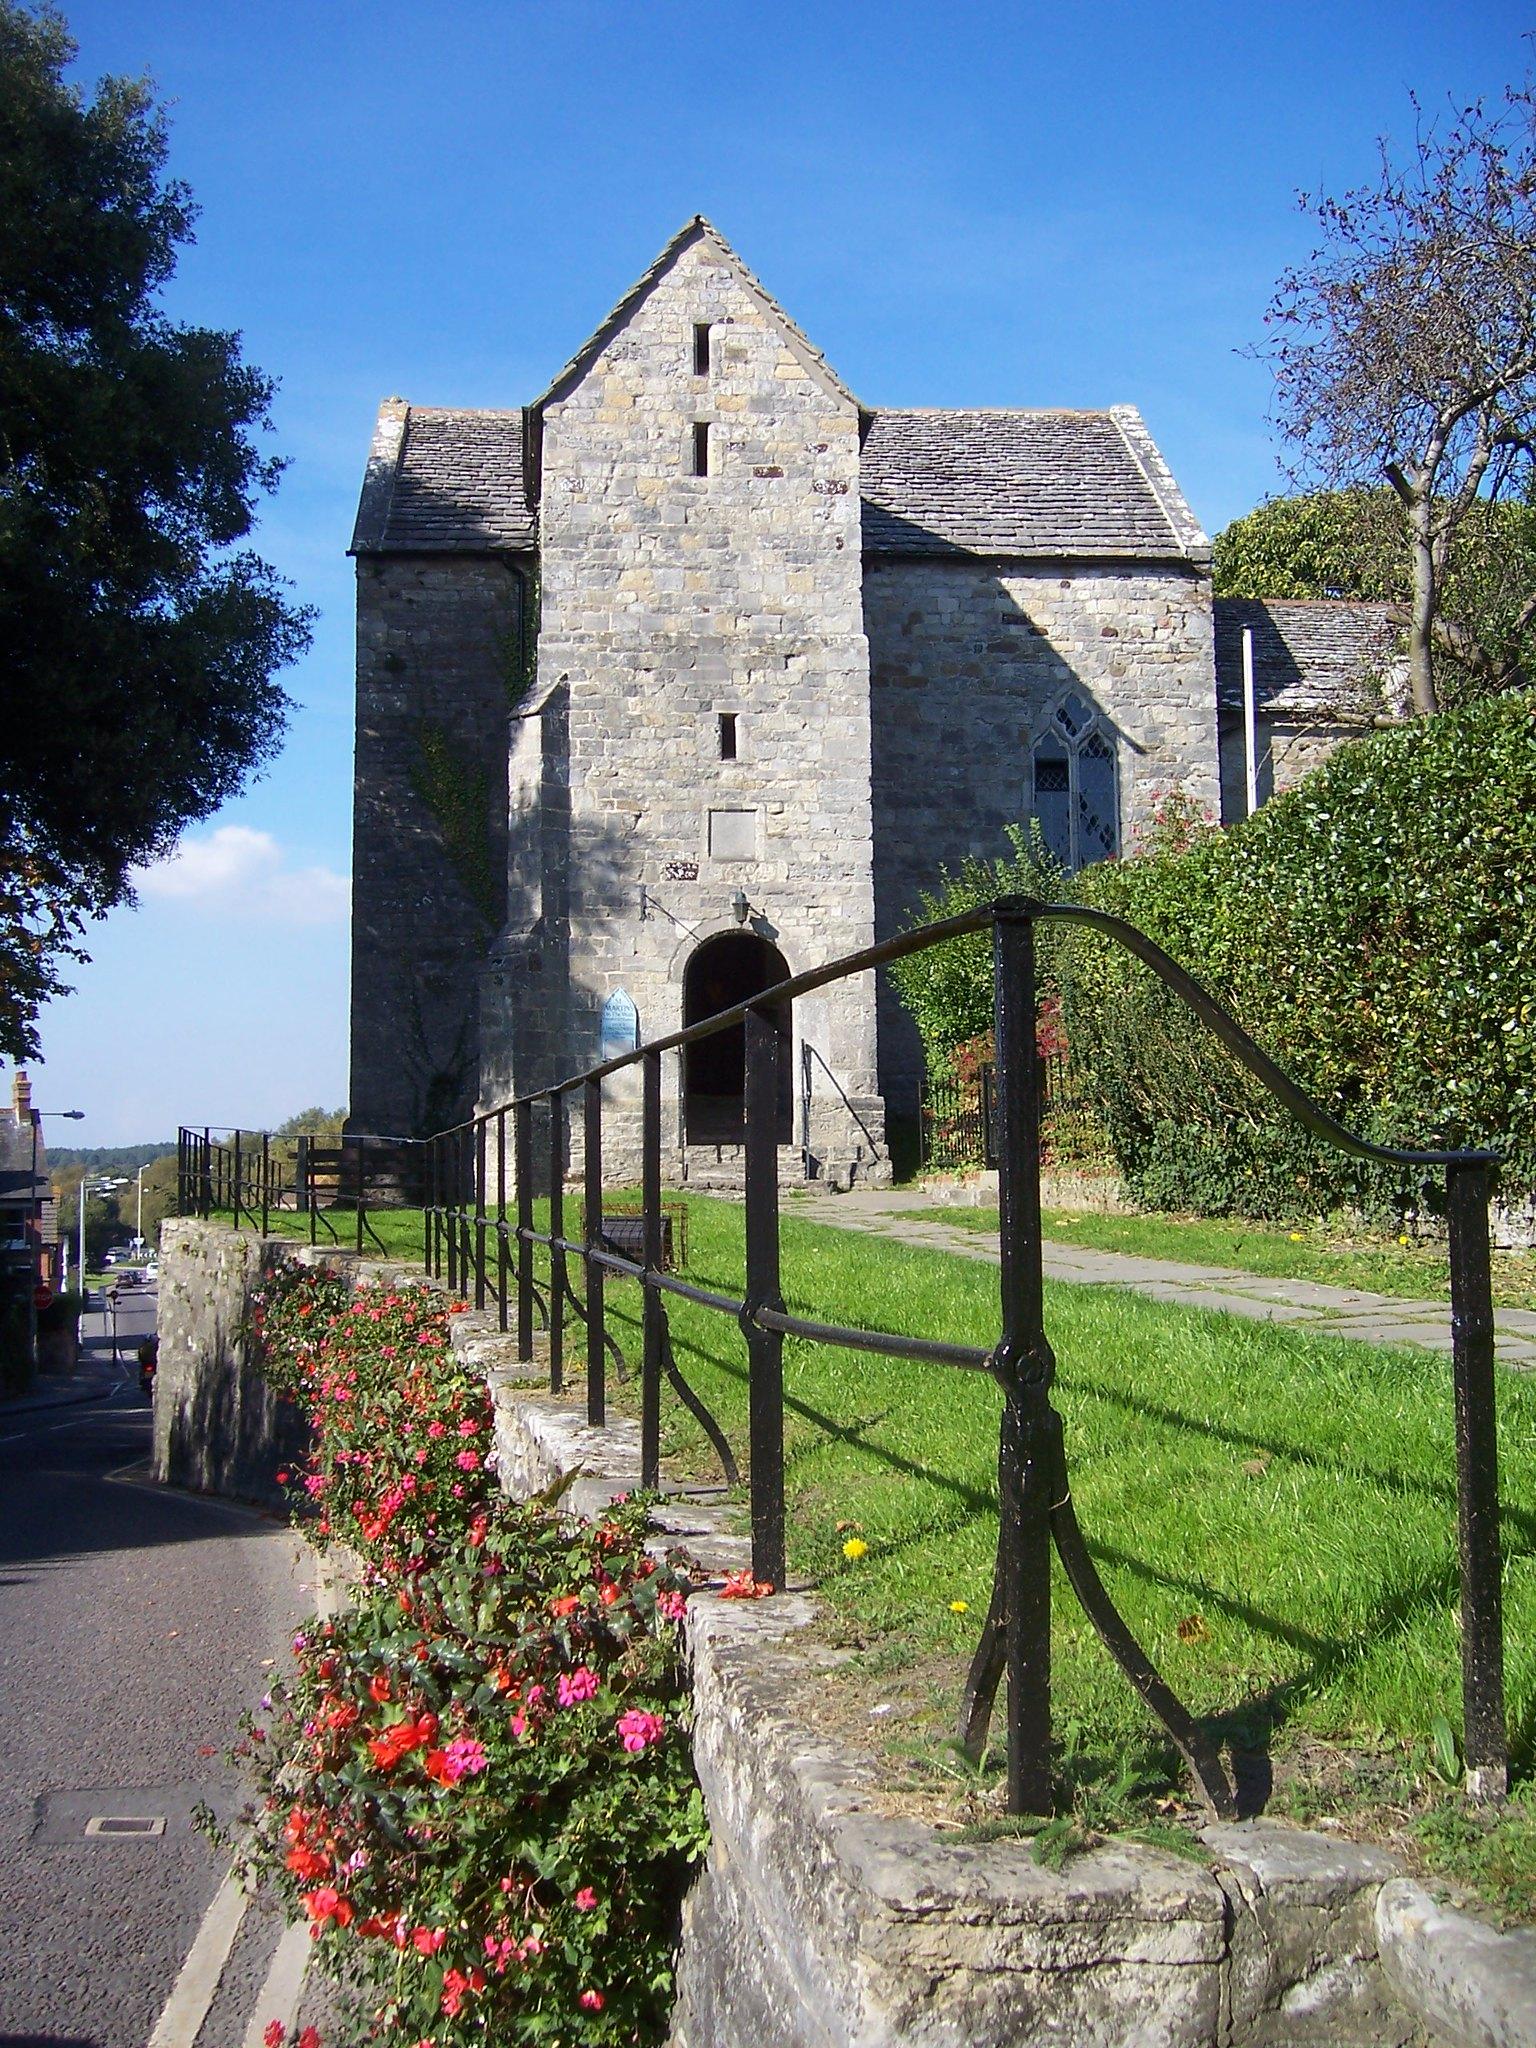 Wareham church and Saxon walls   Wareham